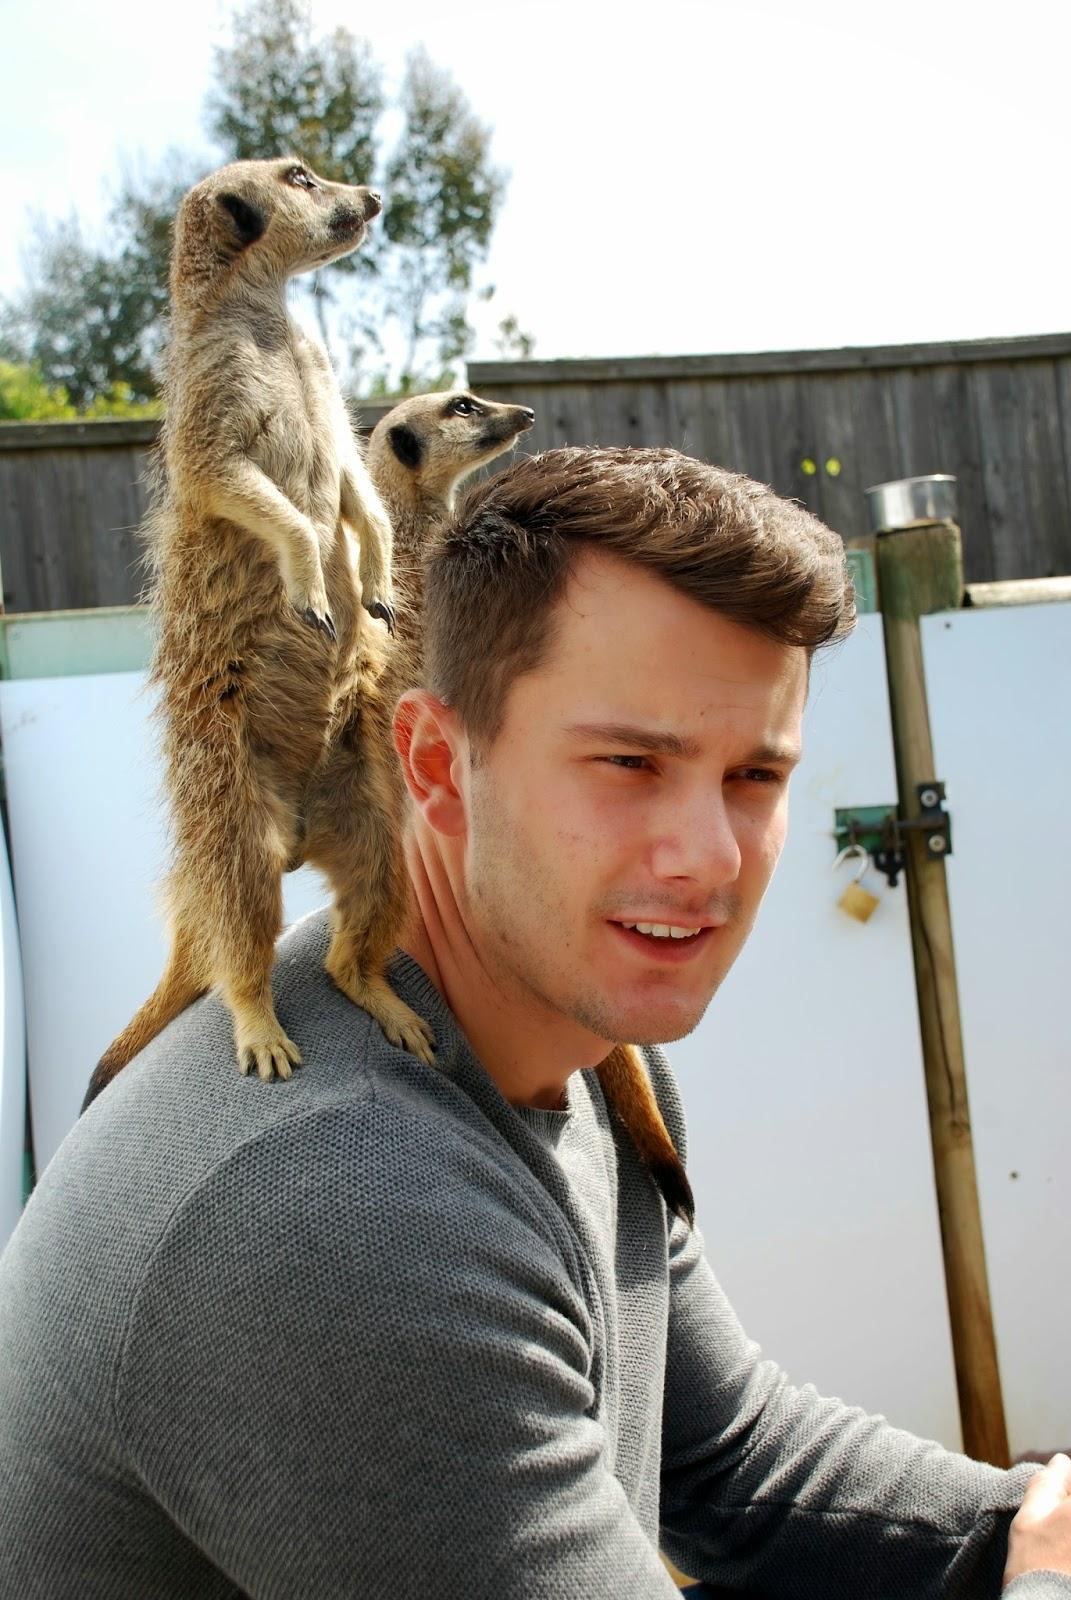 Meerkats climbing on Jonny at paradise wildlife park